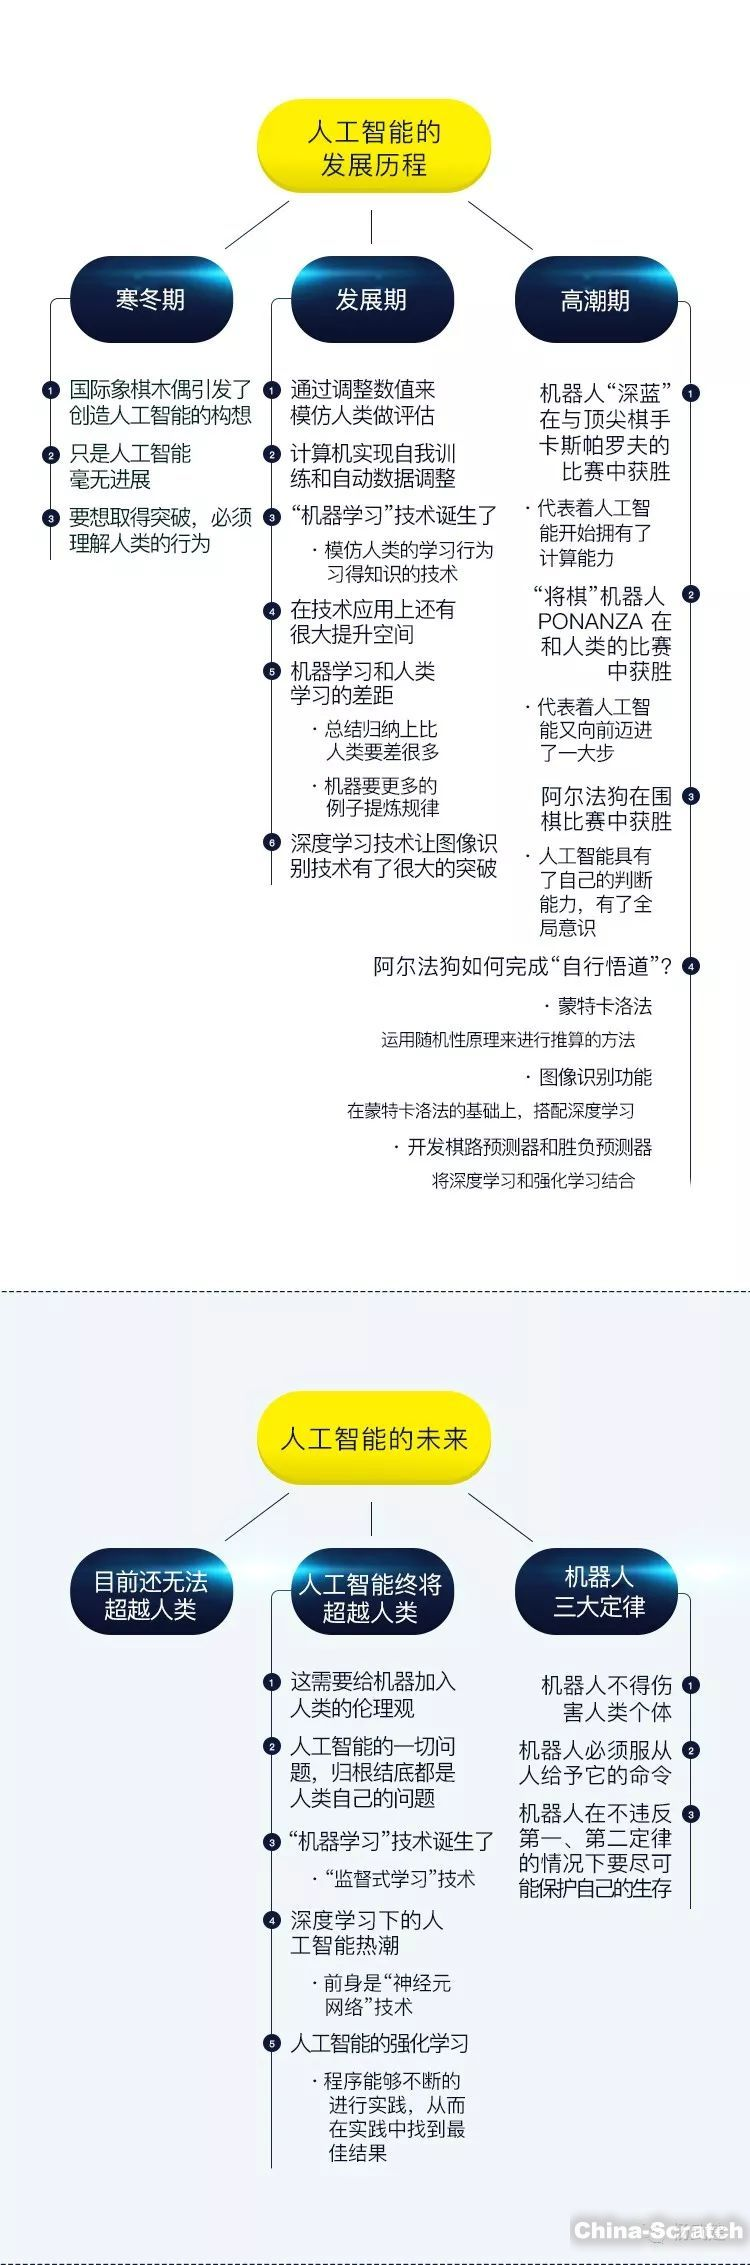 https://www.china-scratch.com/Uploads/timg/190912/12314G125-3.jpg